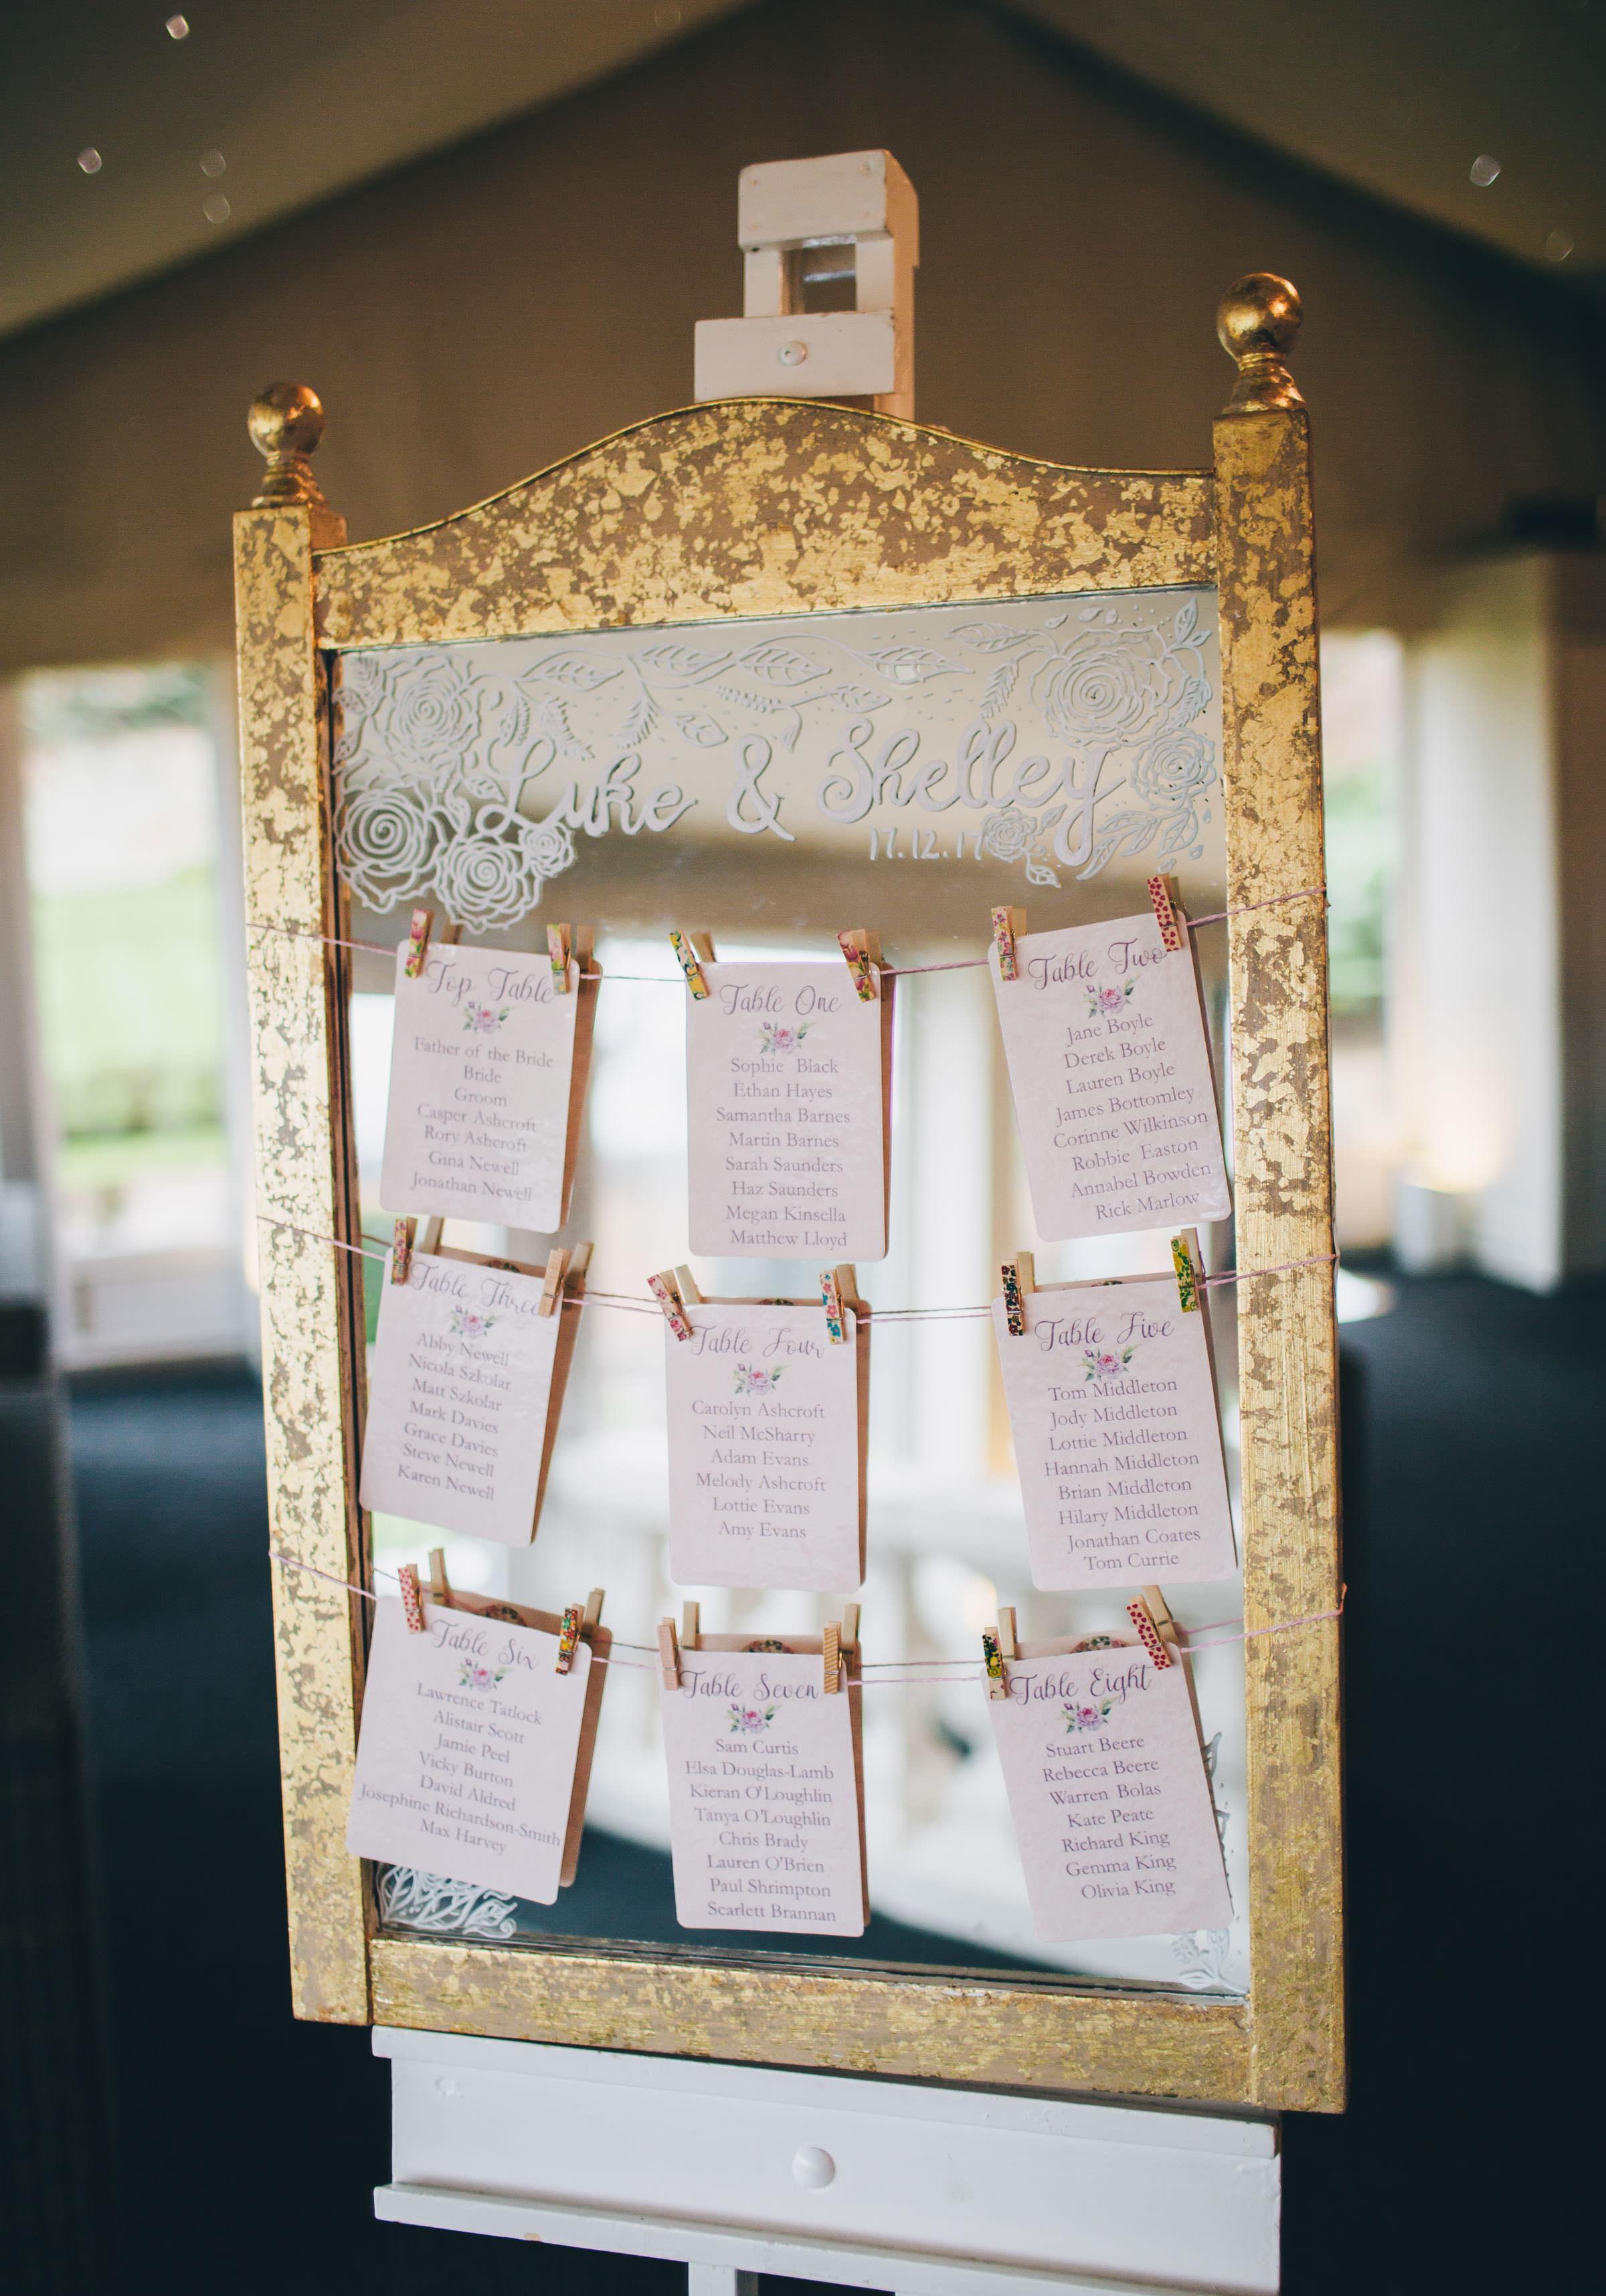 handmade table settings - Combermere Abbey wedding